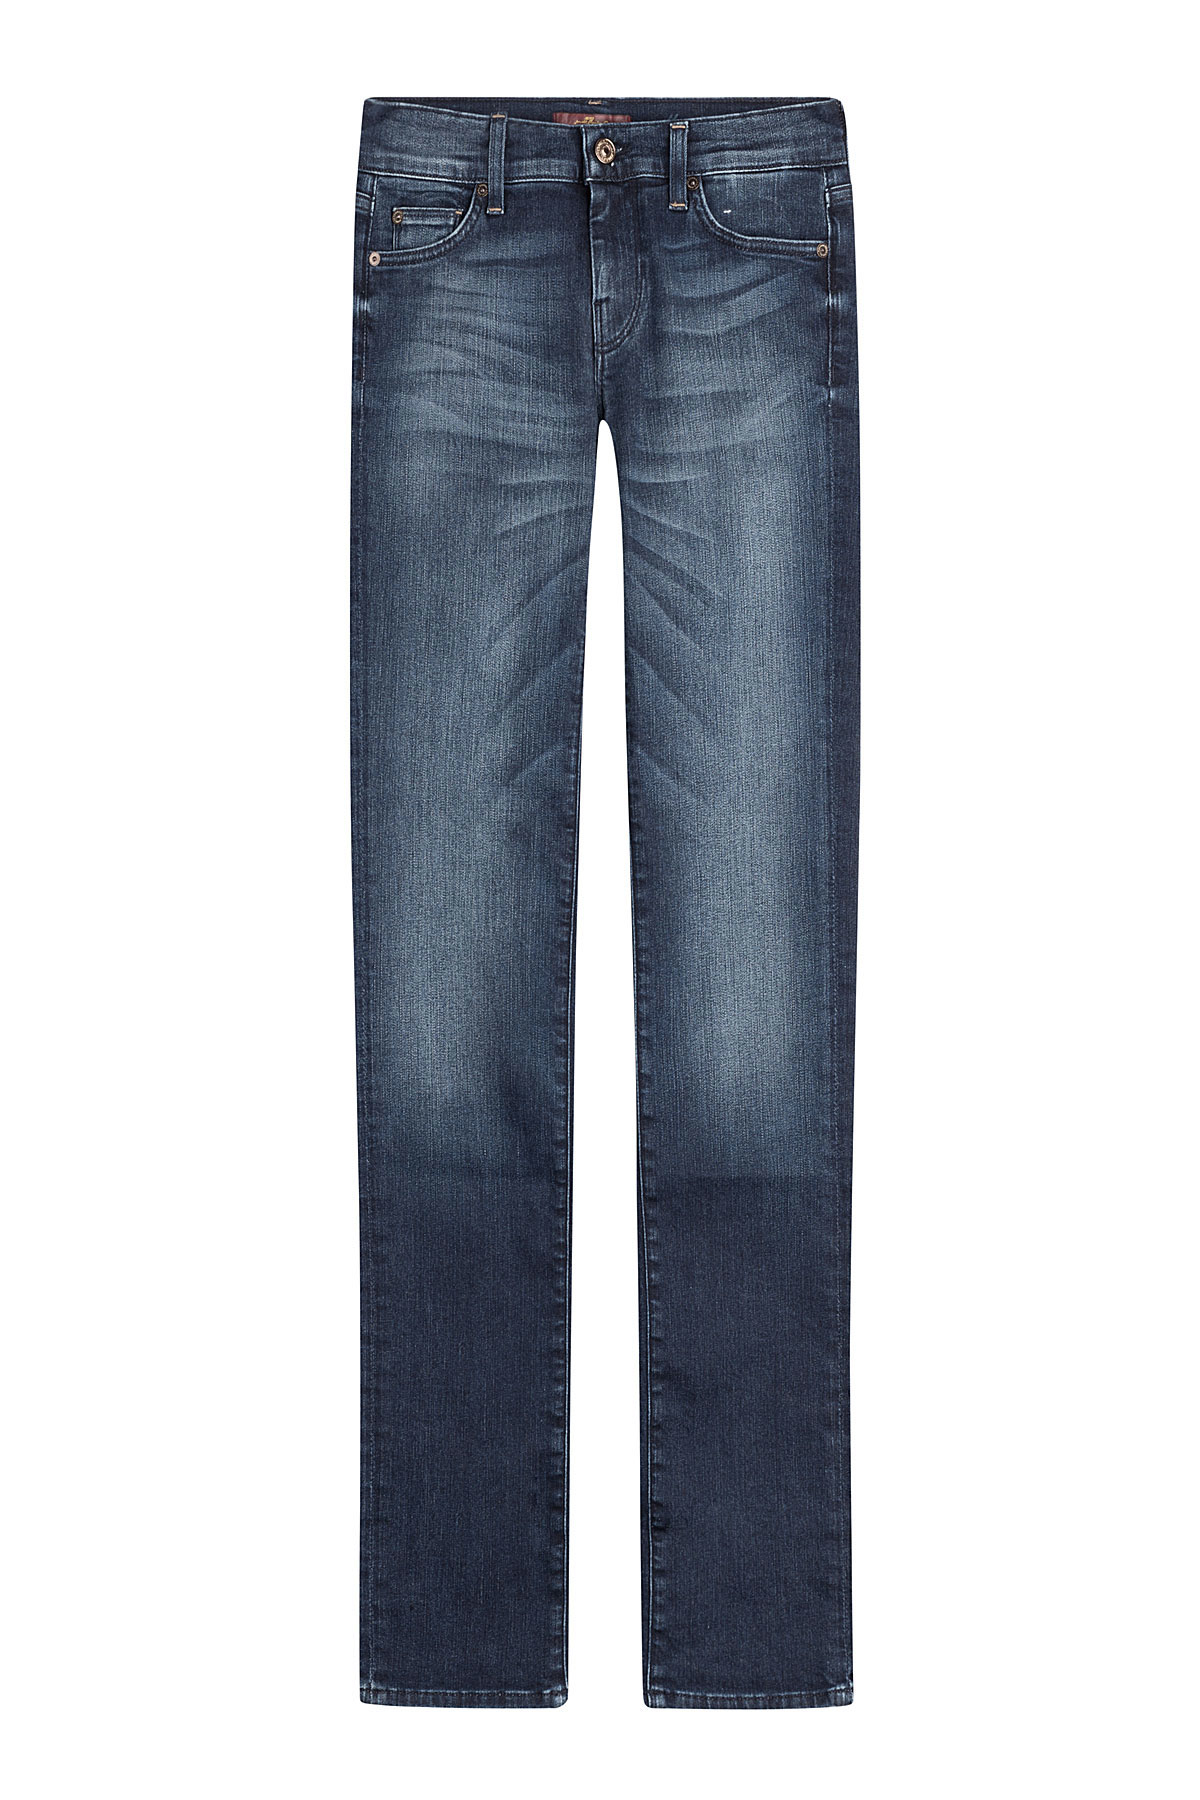 7 for all mankind slim straight leg jeans blue in blue. Black Bedroom Furniture Sets. Home Design Ideas